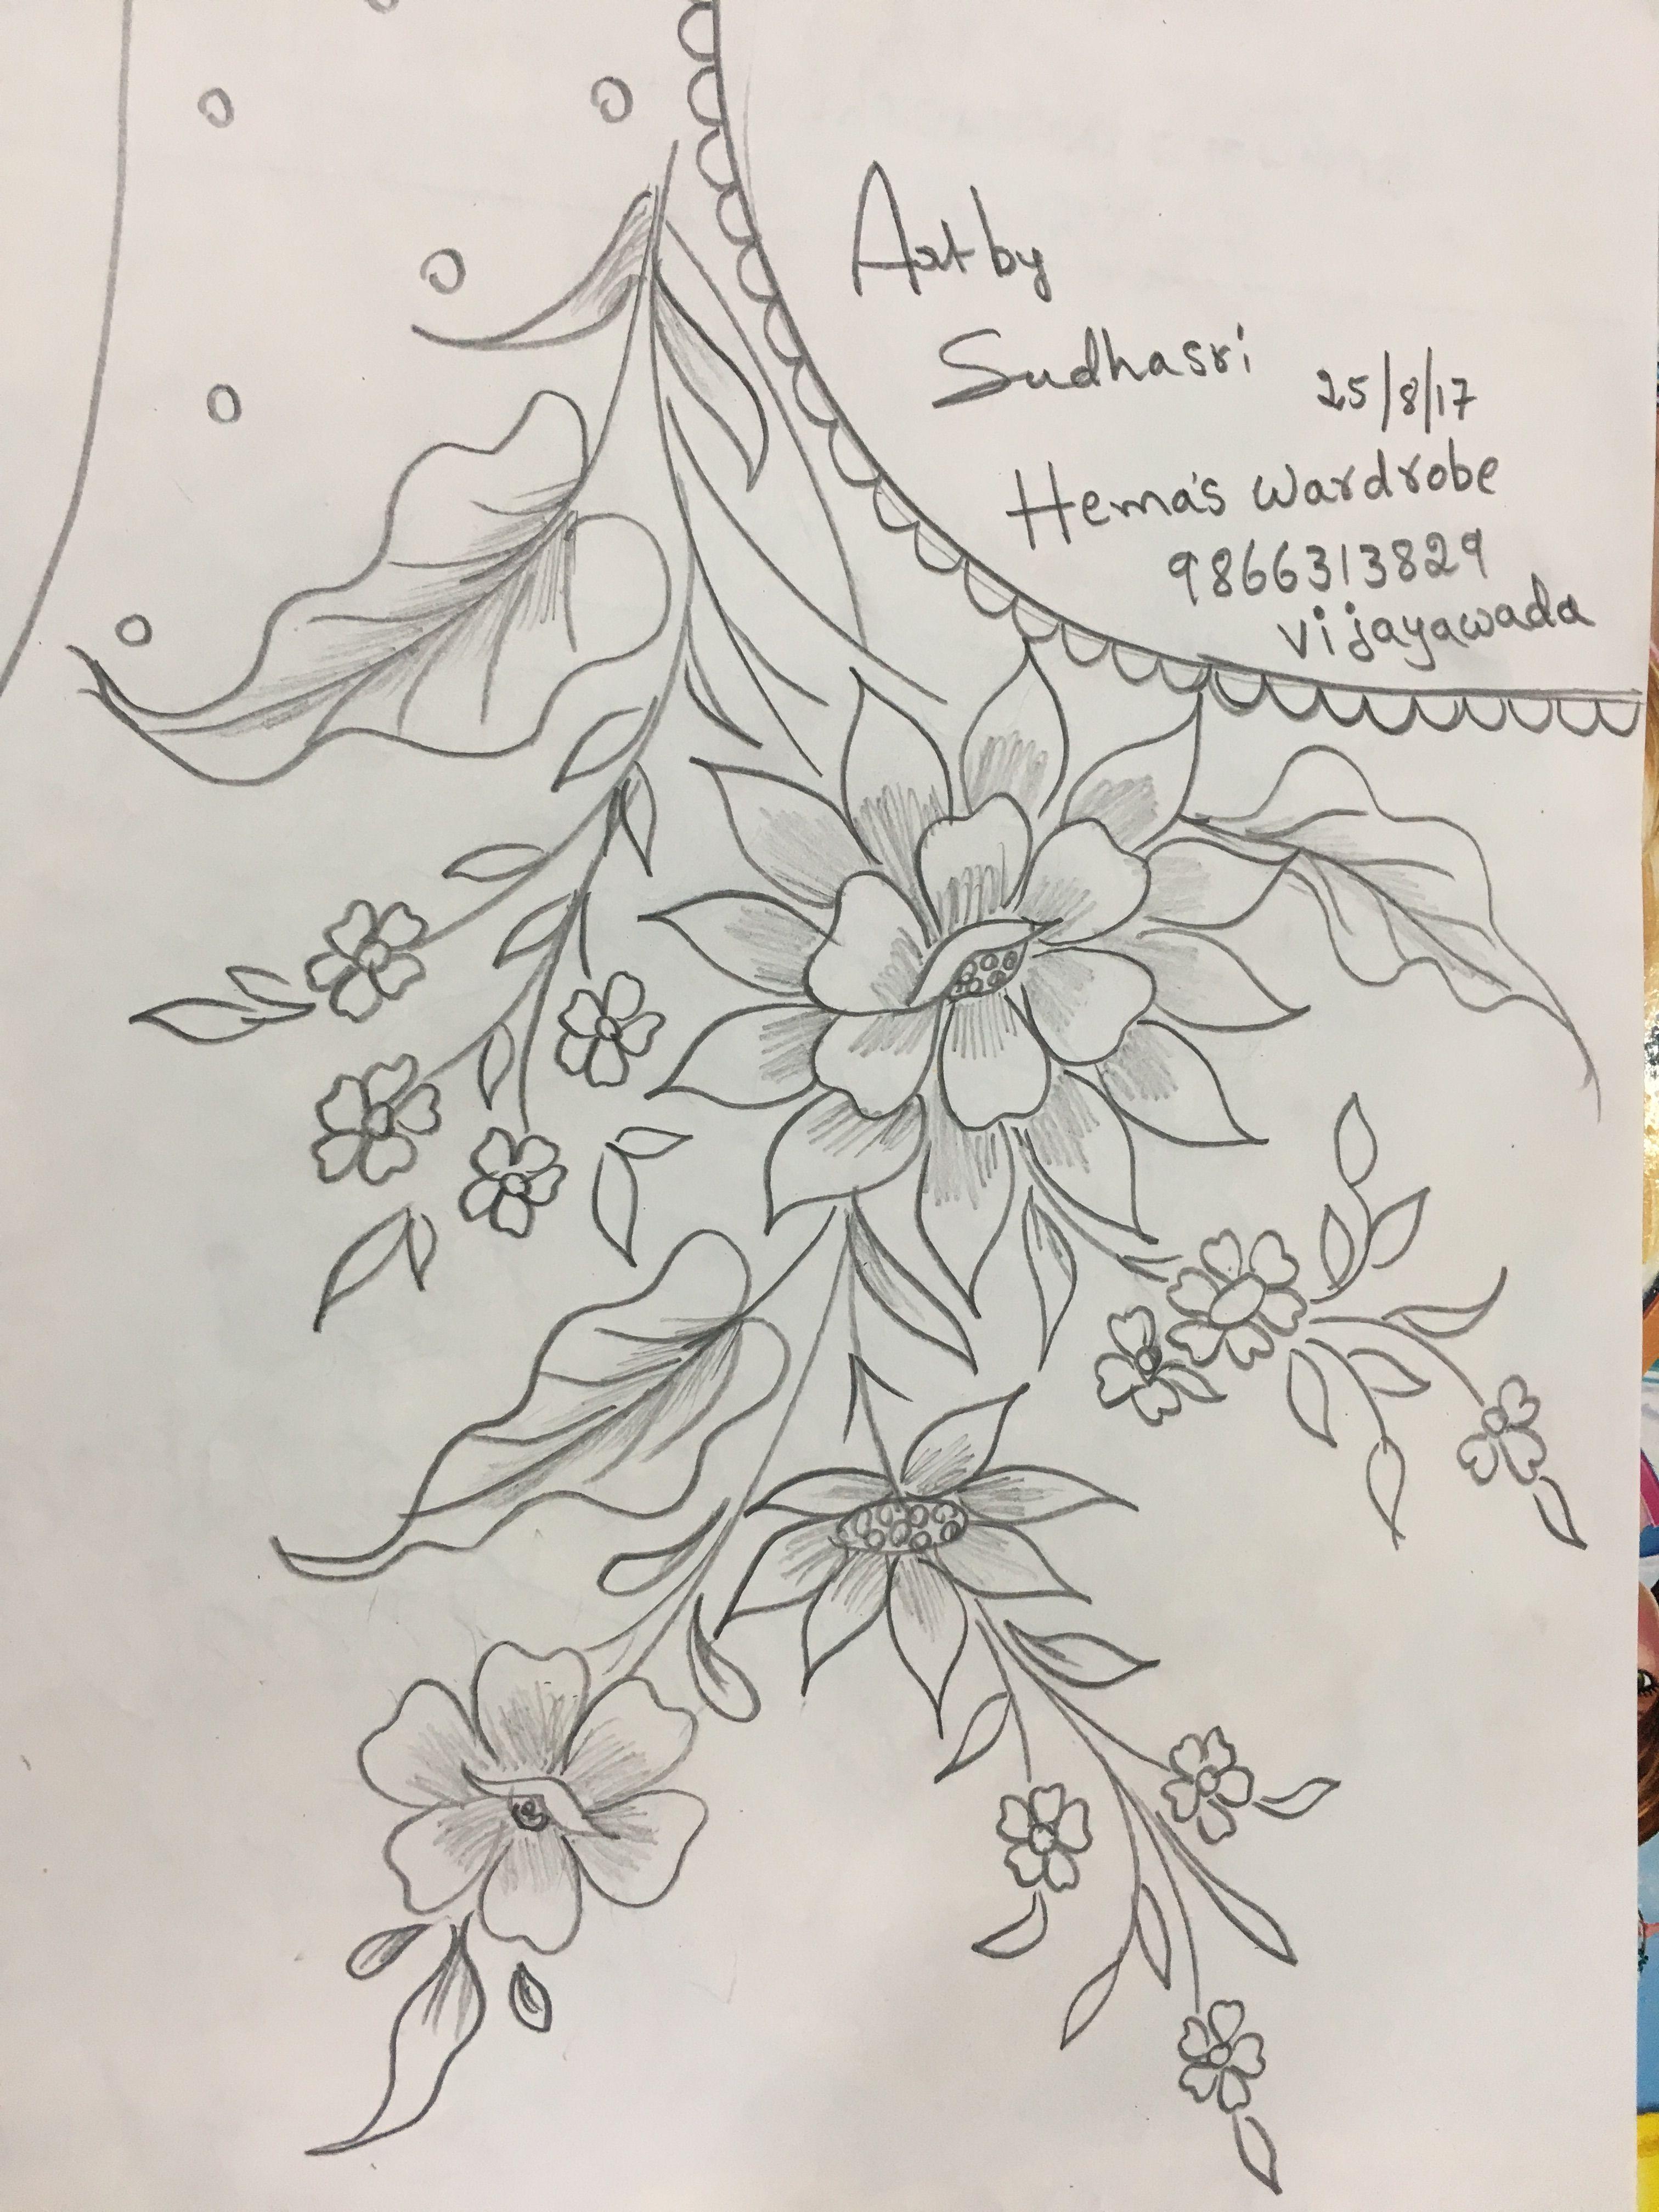 Sudhasri hemaswardrobe | eembroidddry | Pinterest | Bordado, Dibujos ...